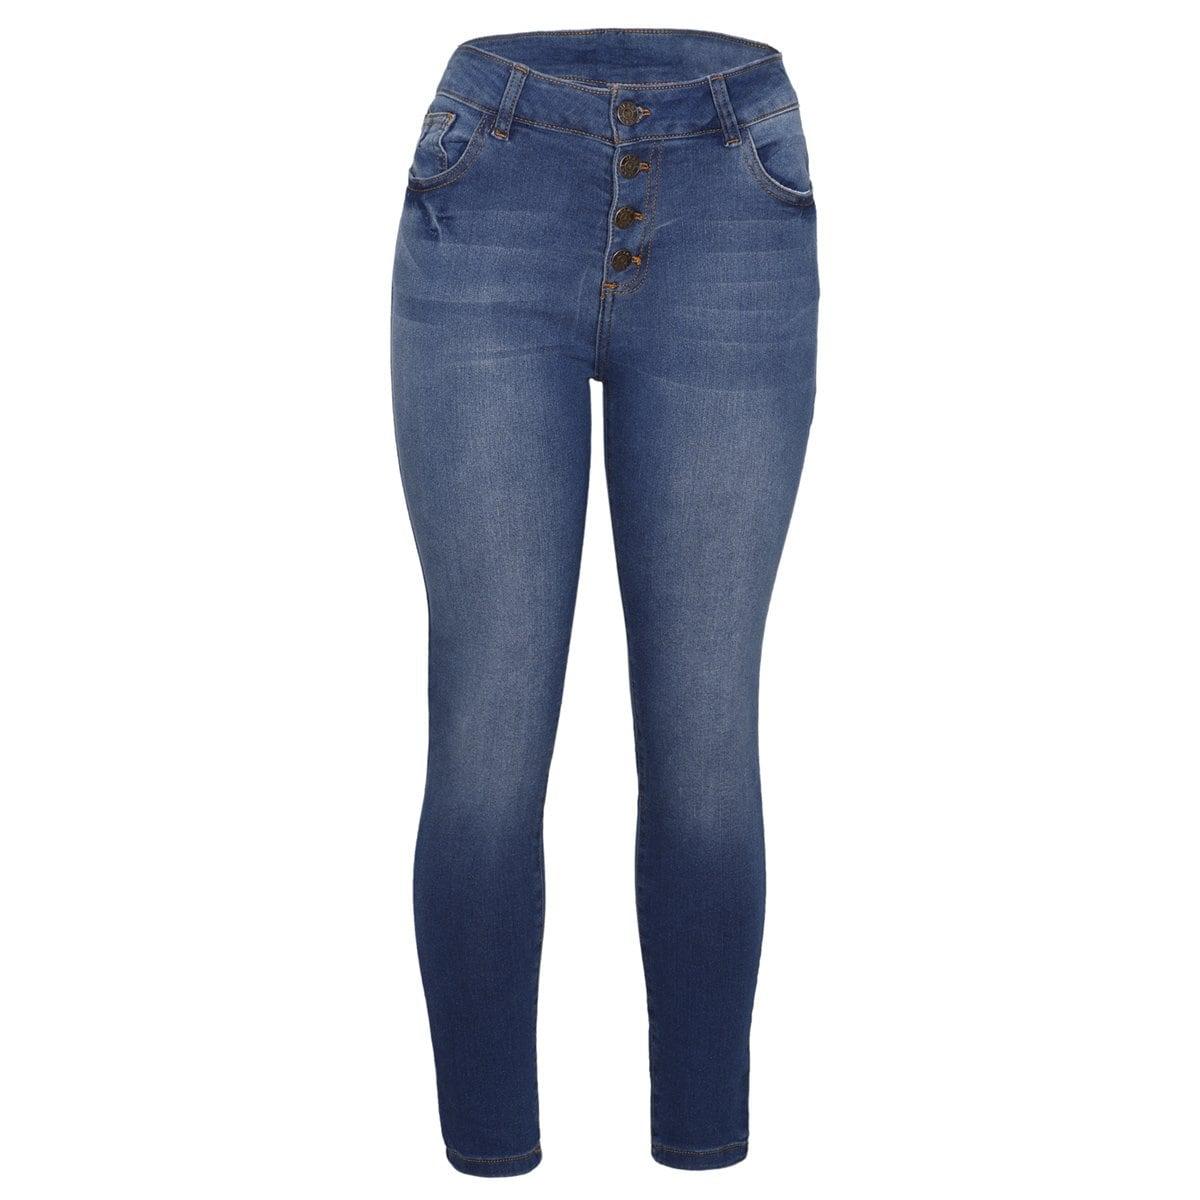 Pantalon Mezclilla Skinny Botones The Blue Revolution Para Dama